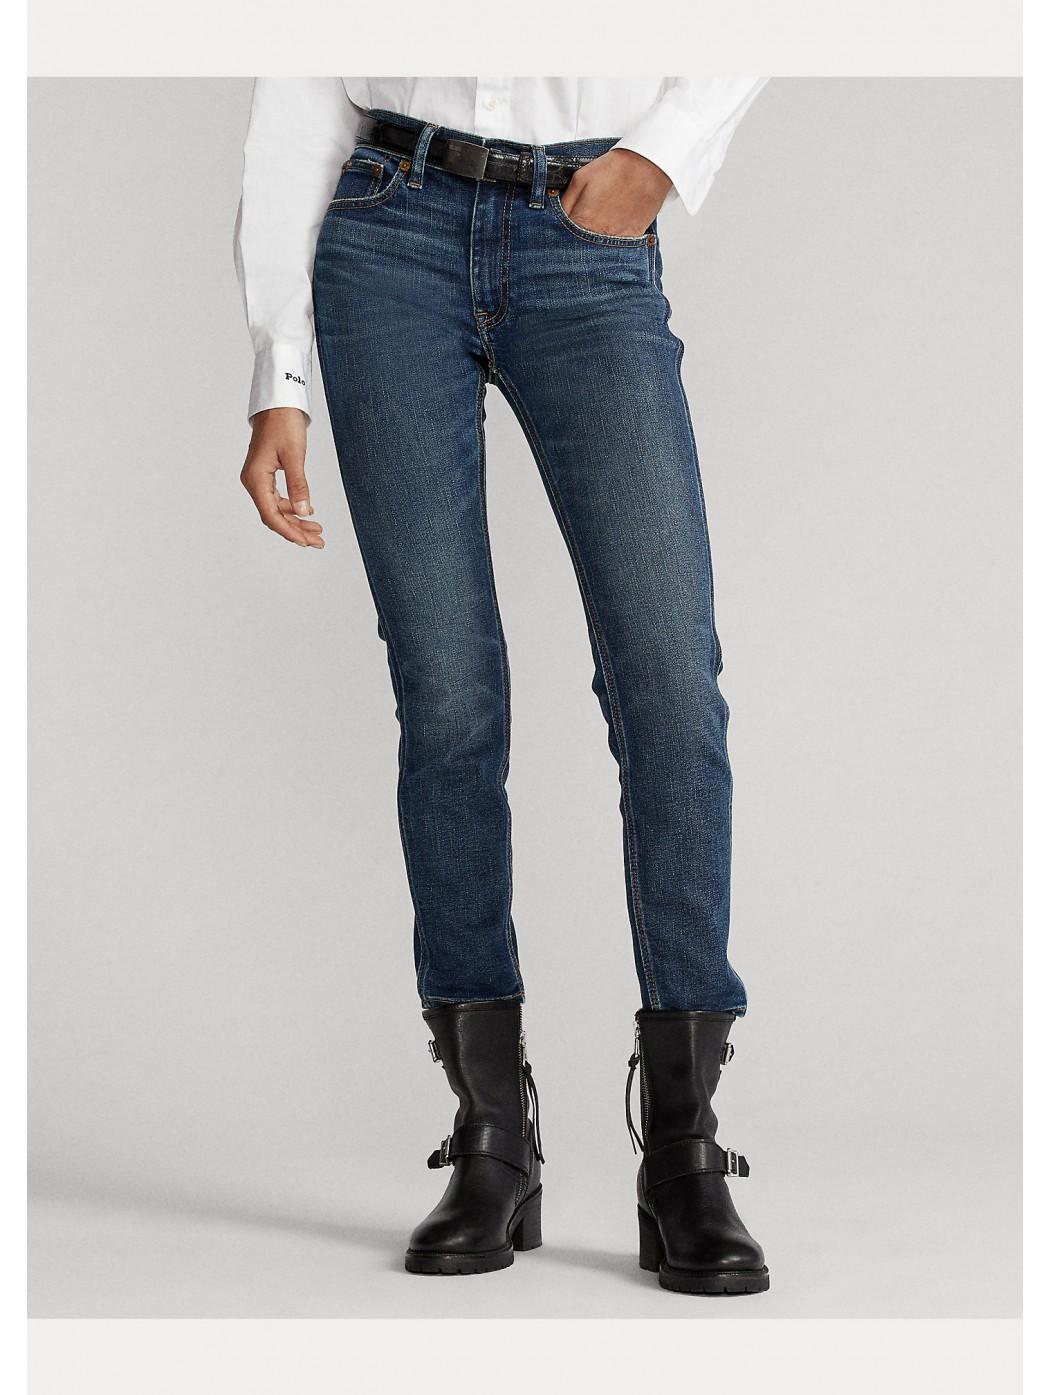 Jeans corti Tompkins skinny POLO RALPH LAUREN DONNA 211799659 001